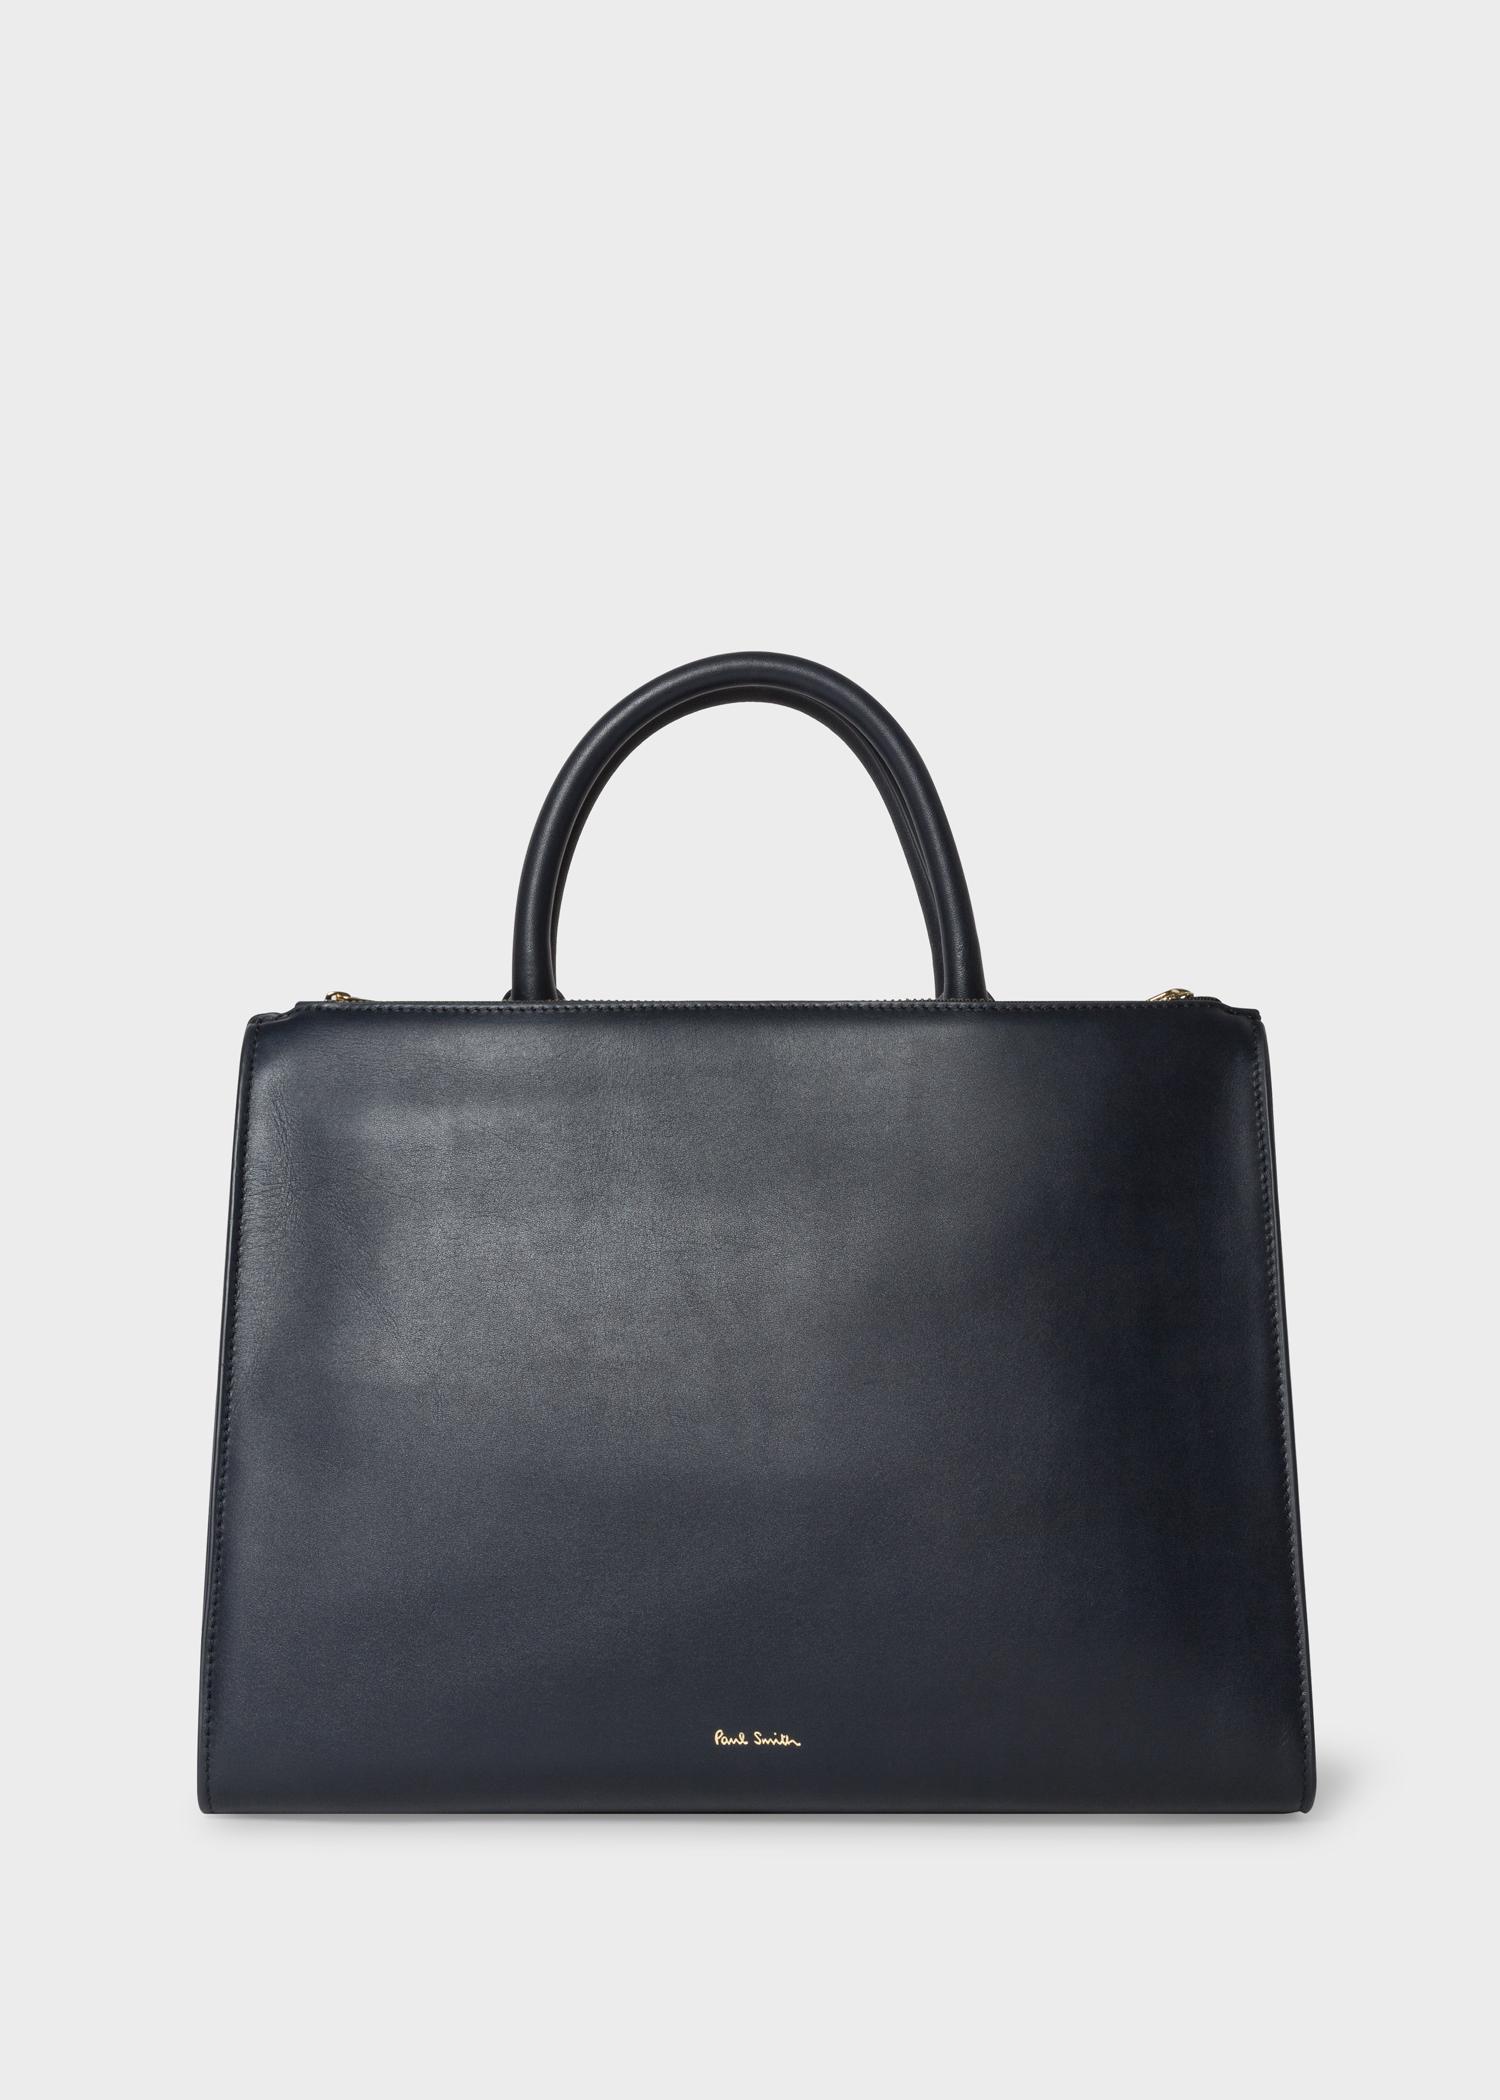 775b950cf14b Women s Navy Leather Double-Zip Tote Bag With  Swirl  Print Trim ...